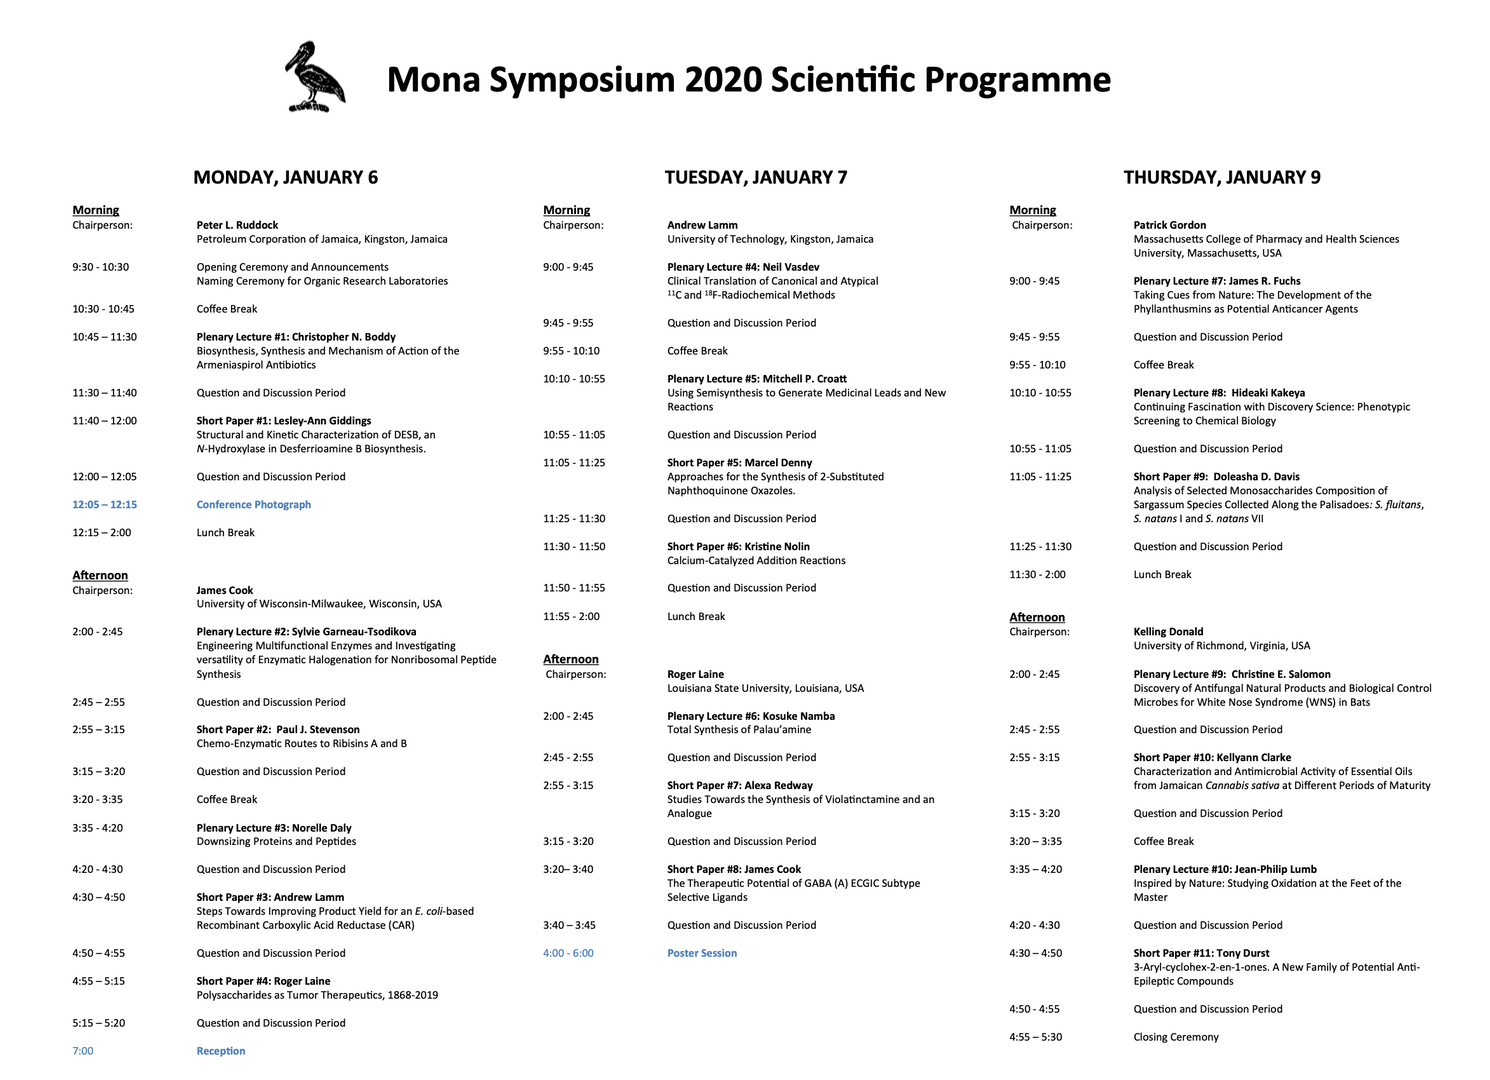 Mona Symposium Programme Summary